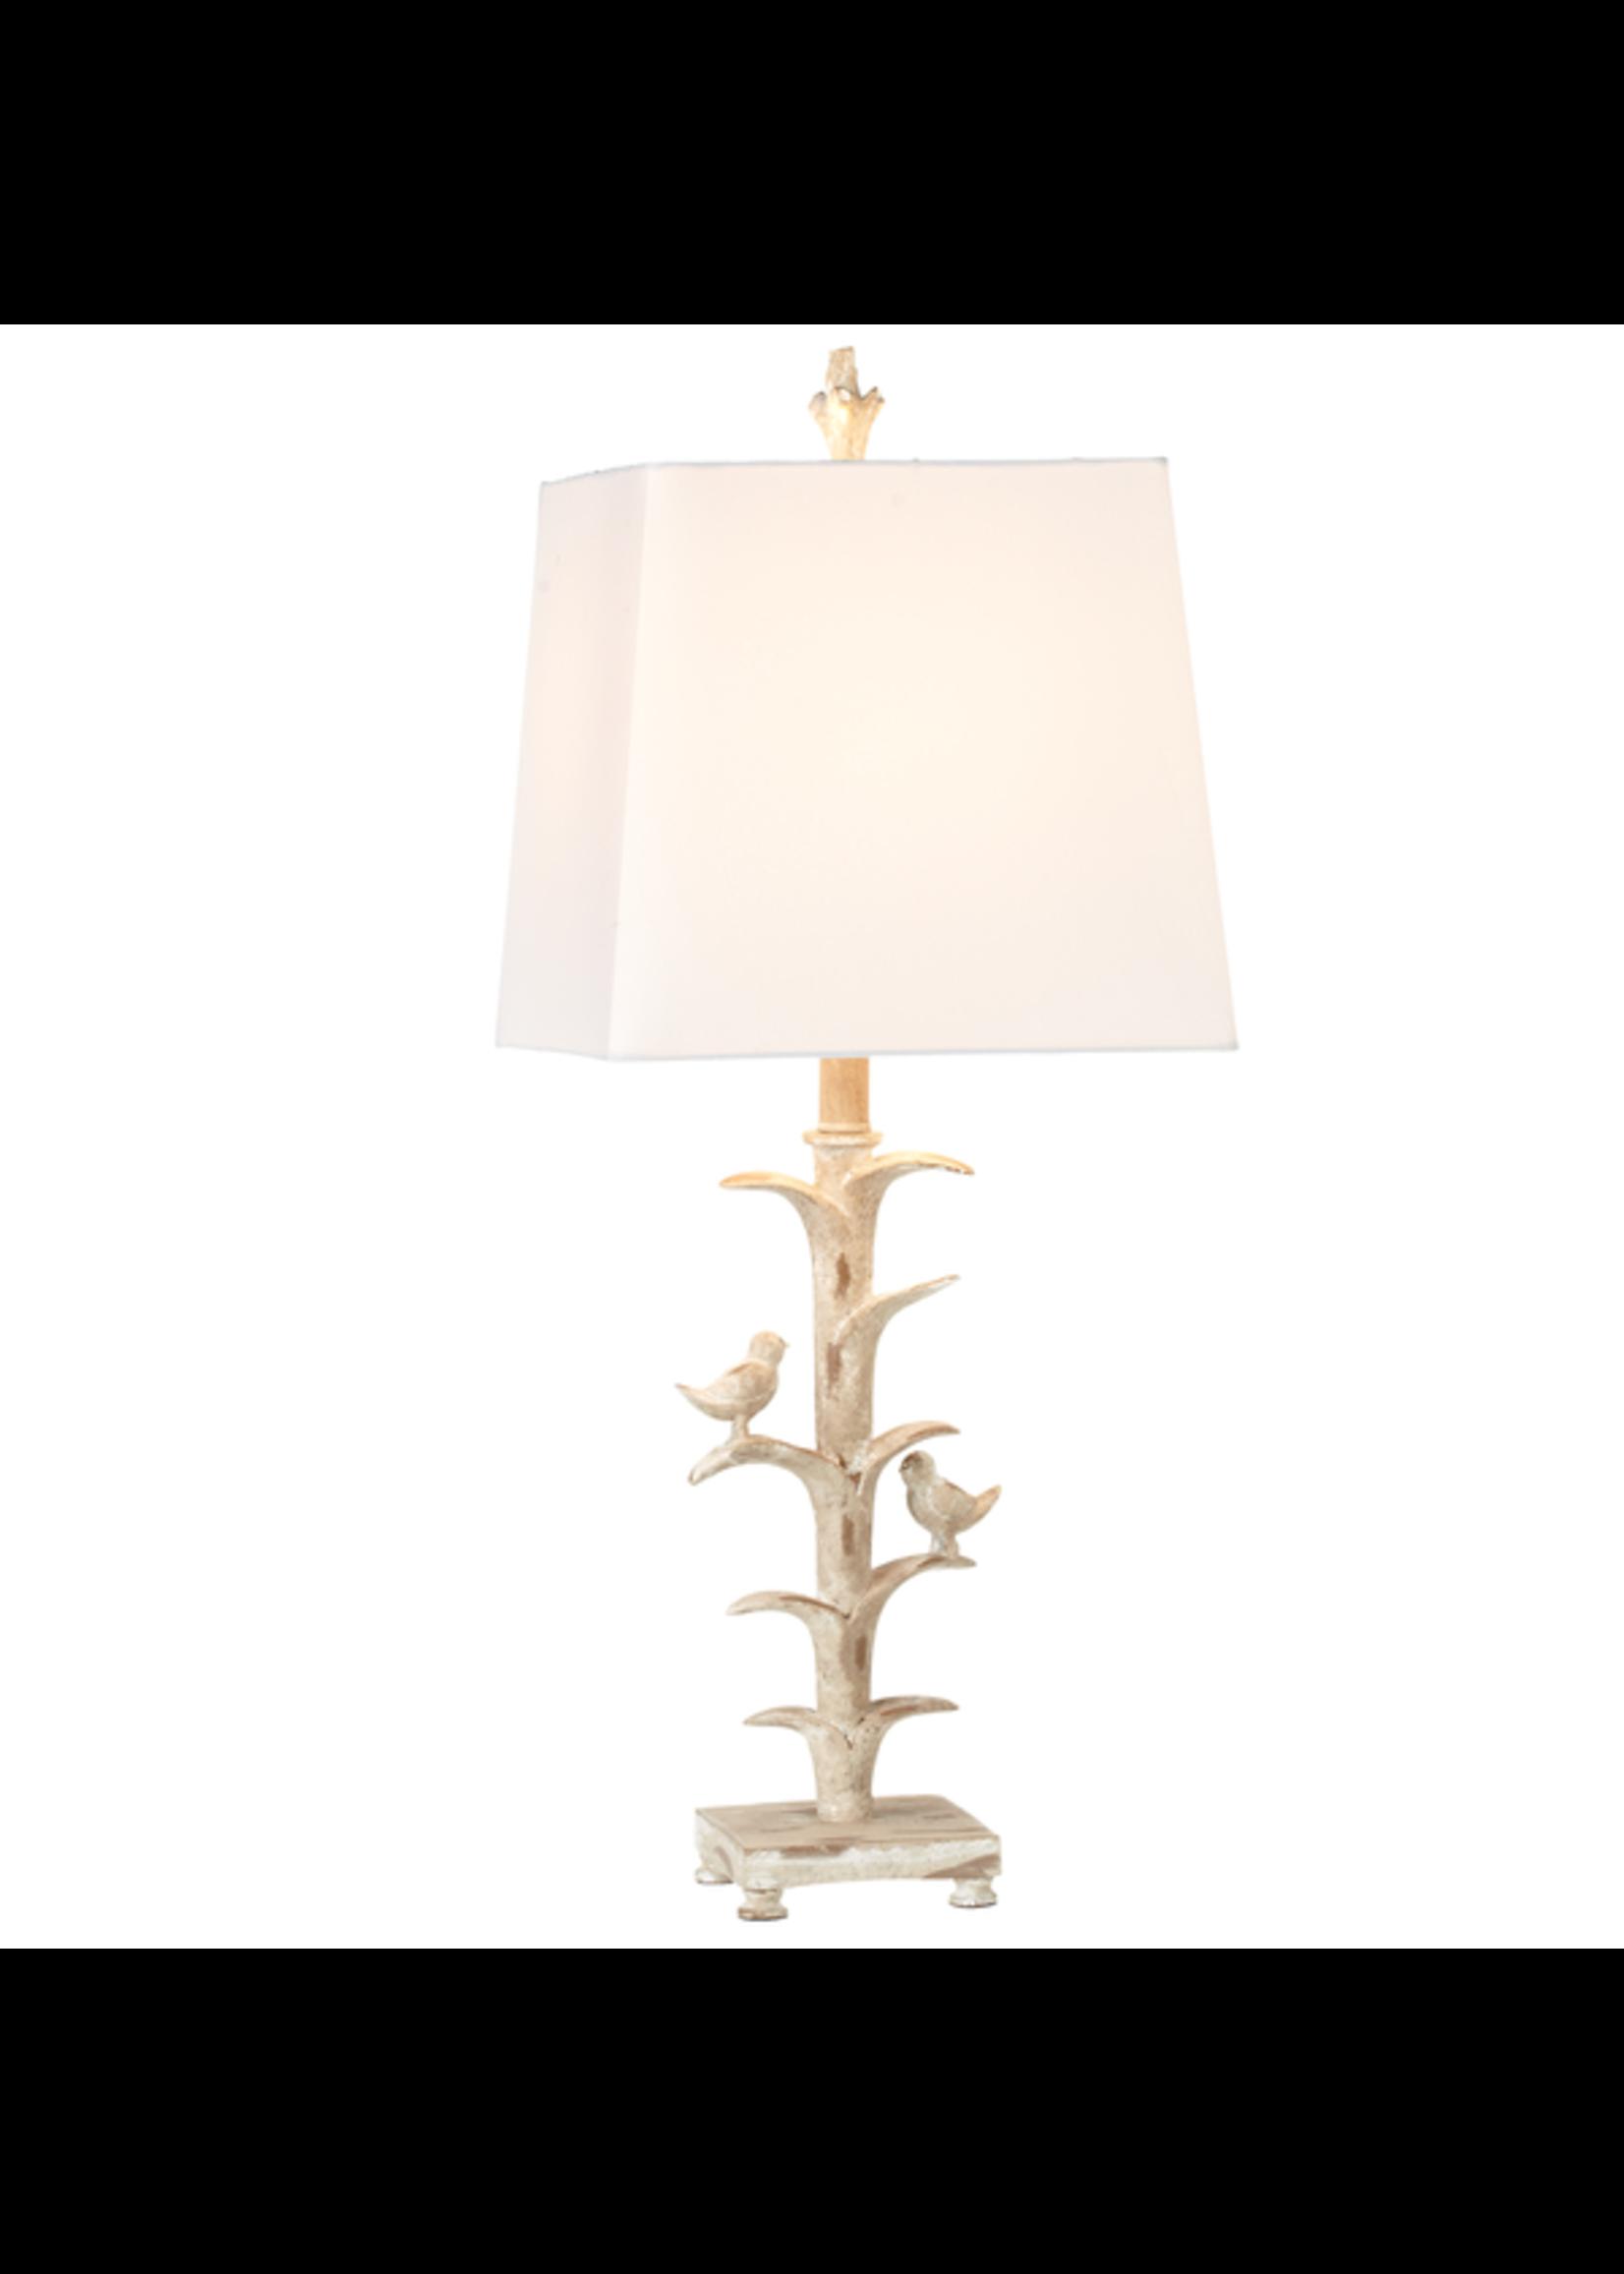 GANZ TABLE LAMP IVORY BIRD BRANCH